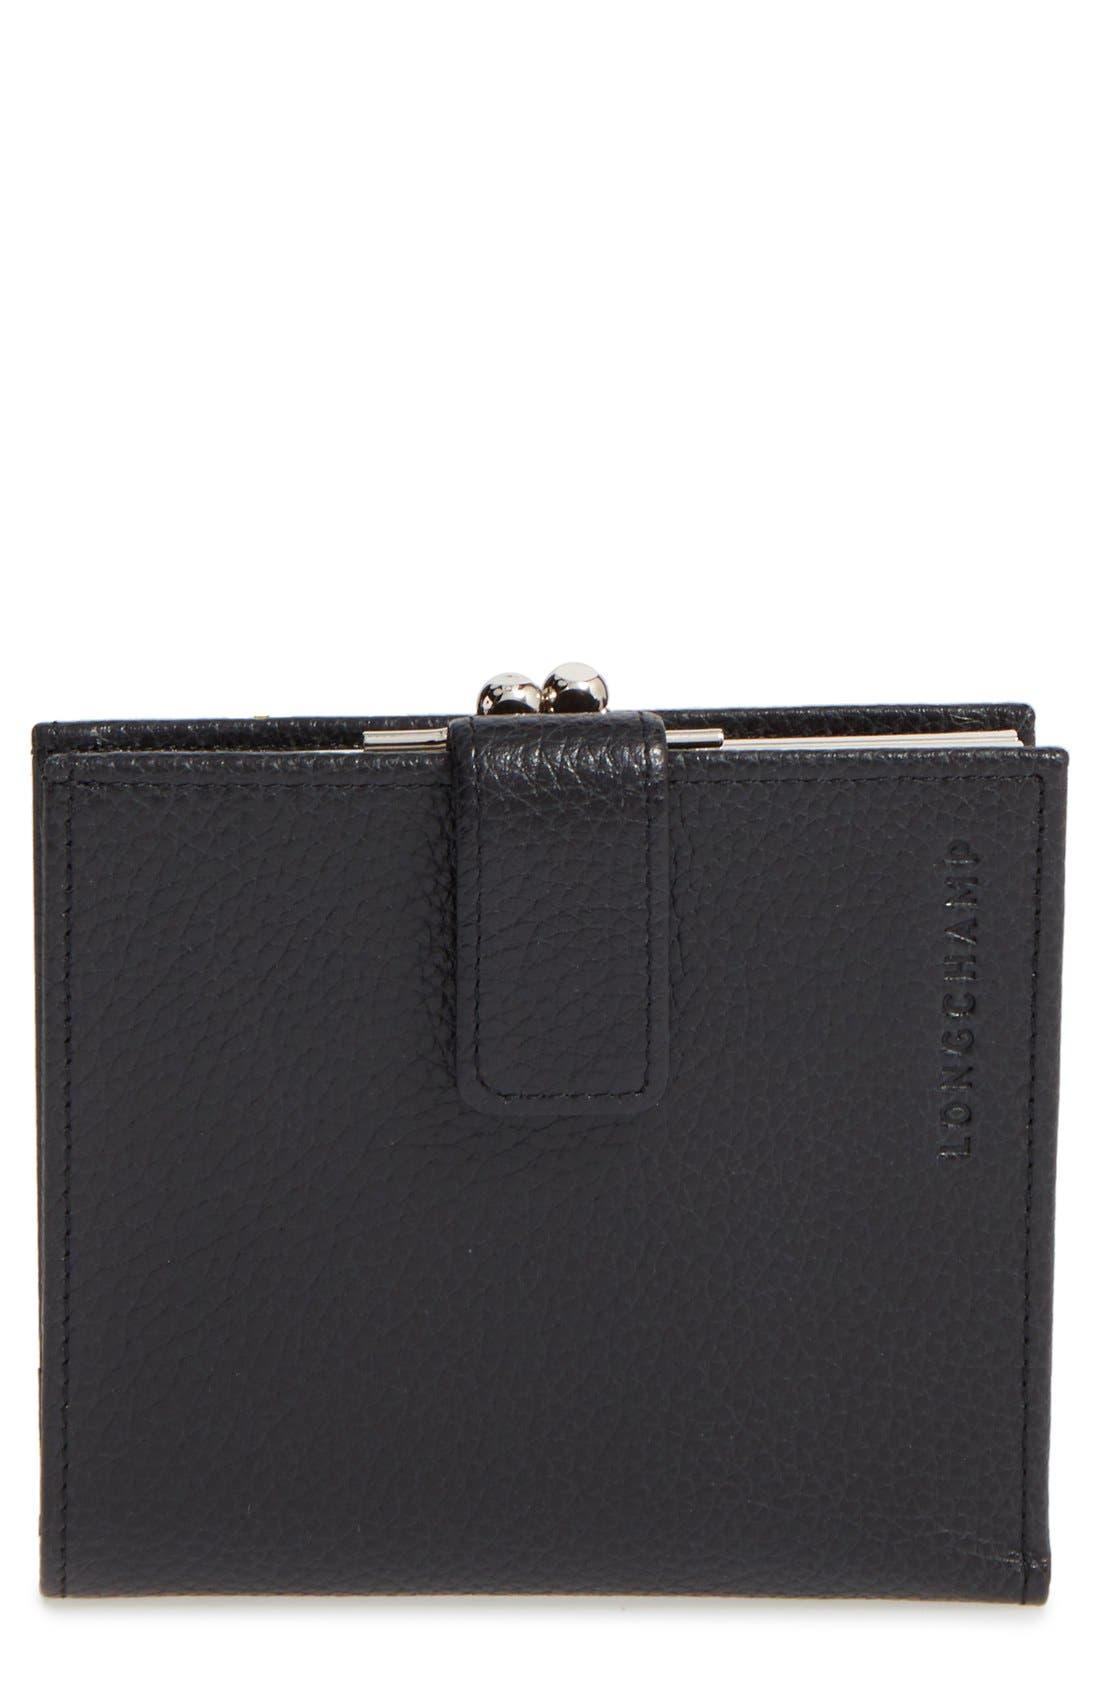 Alternate Image 1 Selected - Longchamp 'Le Foulonne' Pebbled Leather Wallet